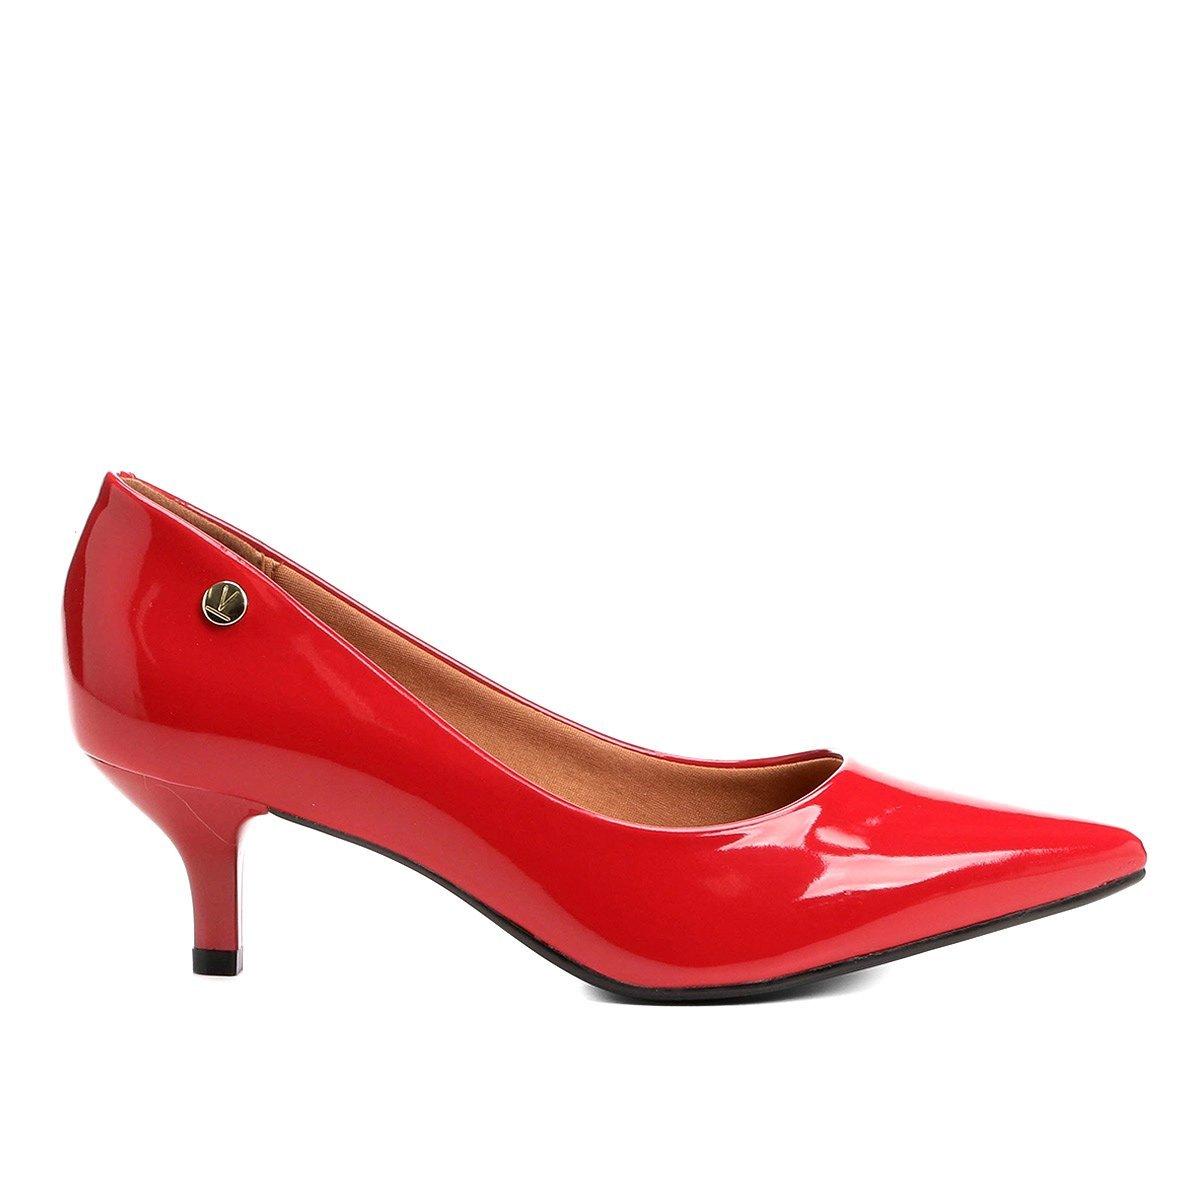 00f88741b6 Sapato Scarpin Salto Baixo Bico Fino Verniz Vizzano Vermelho - MM Concept